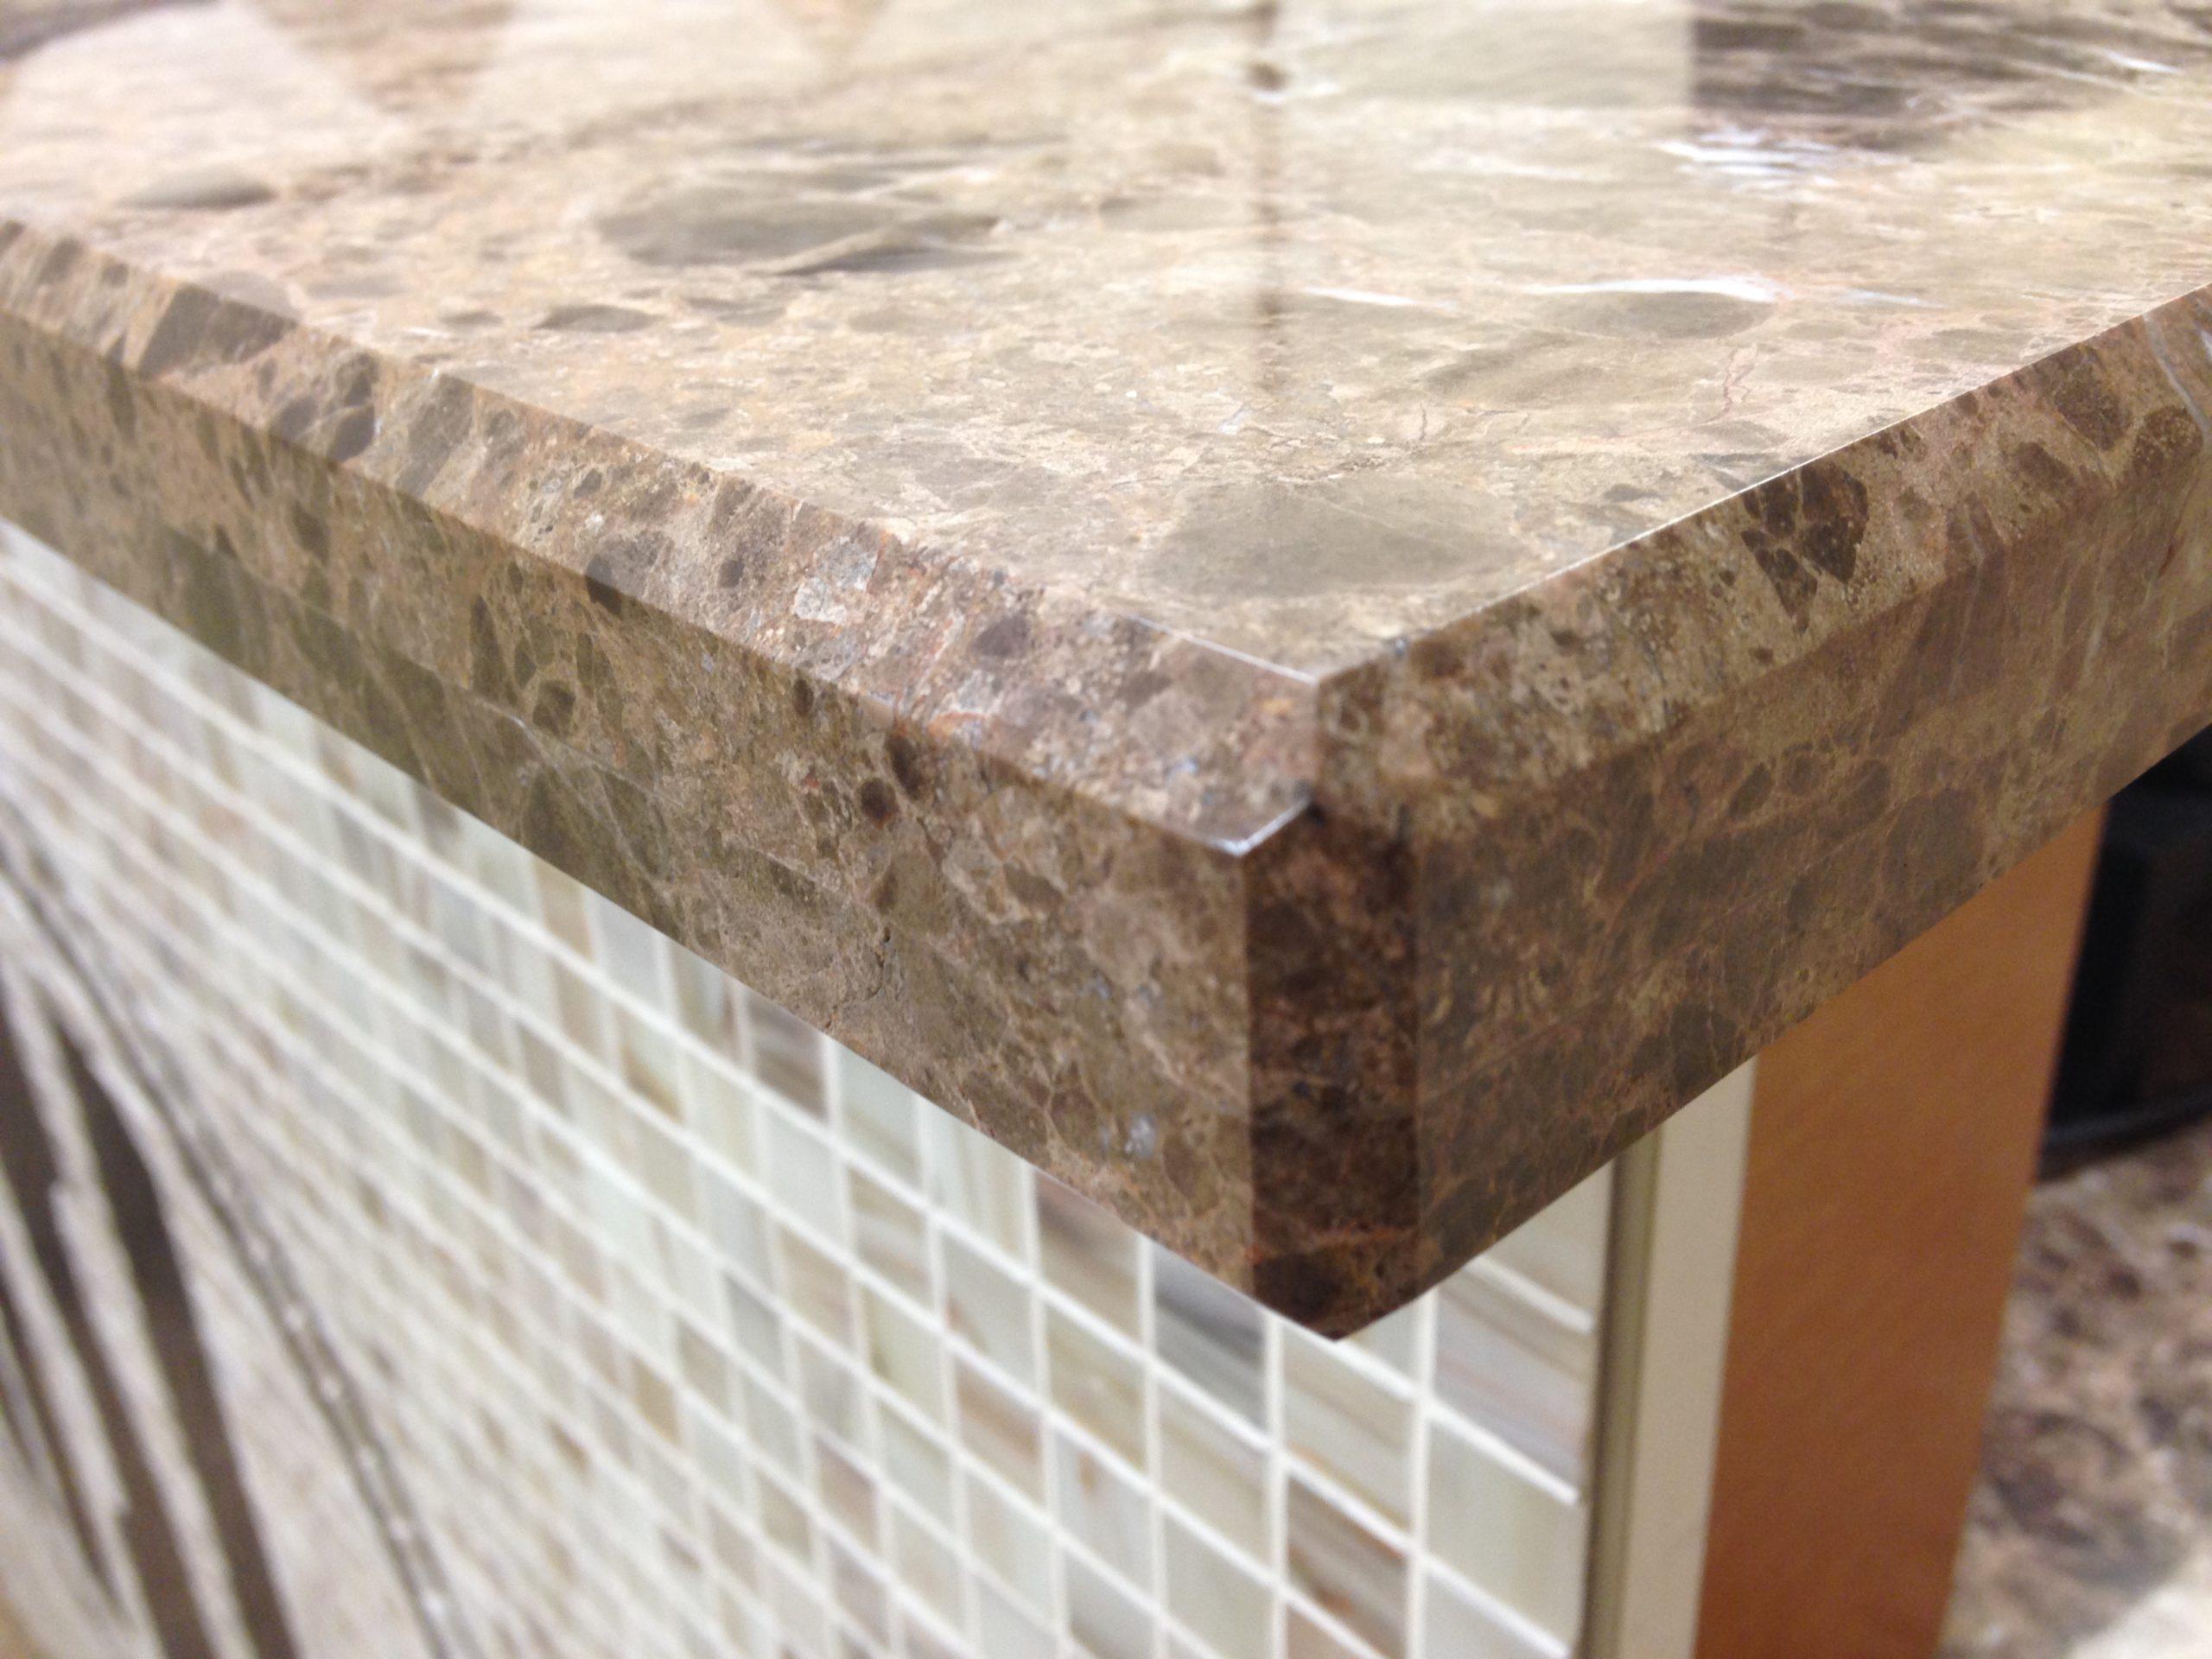 Doubled beveled quartz countertop edge